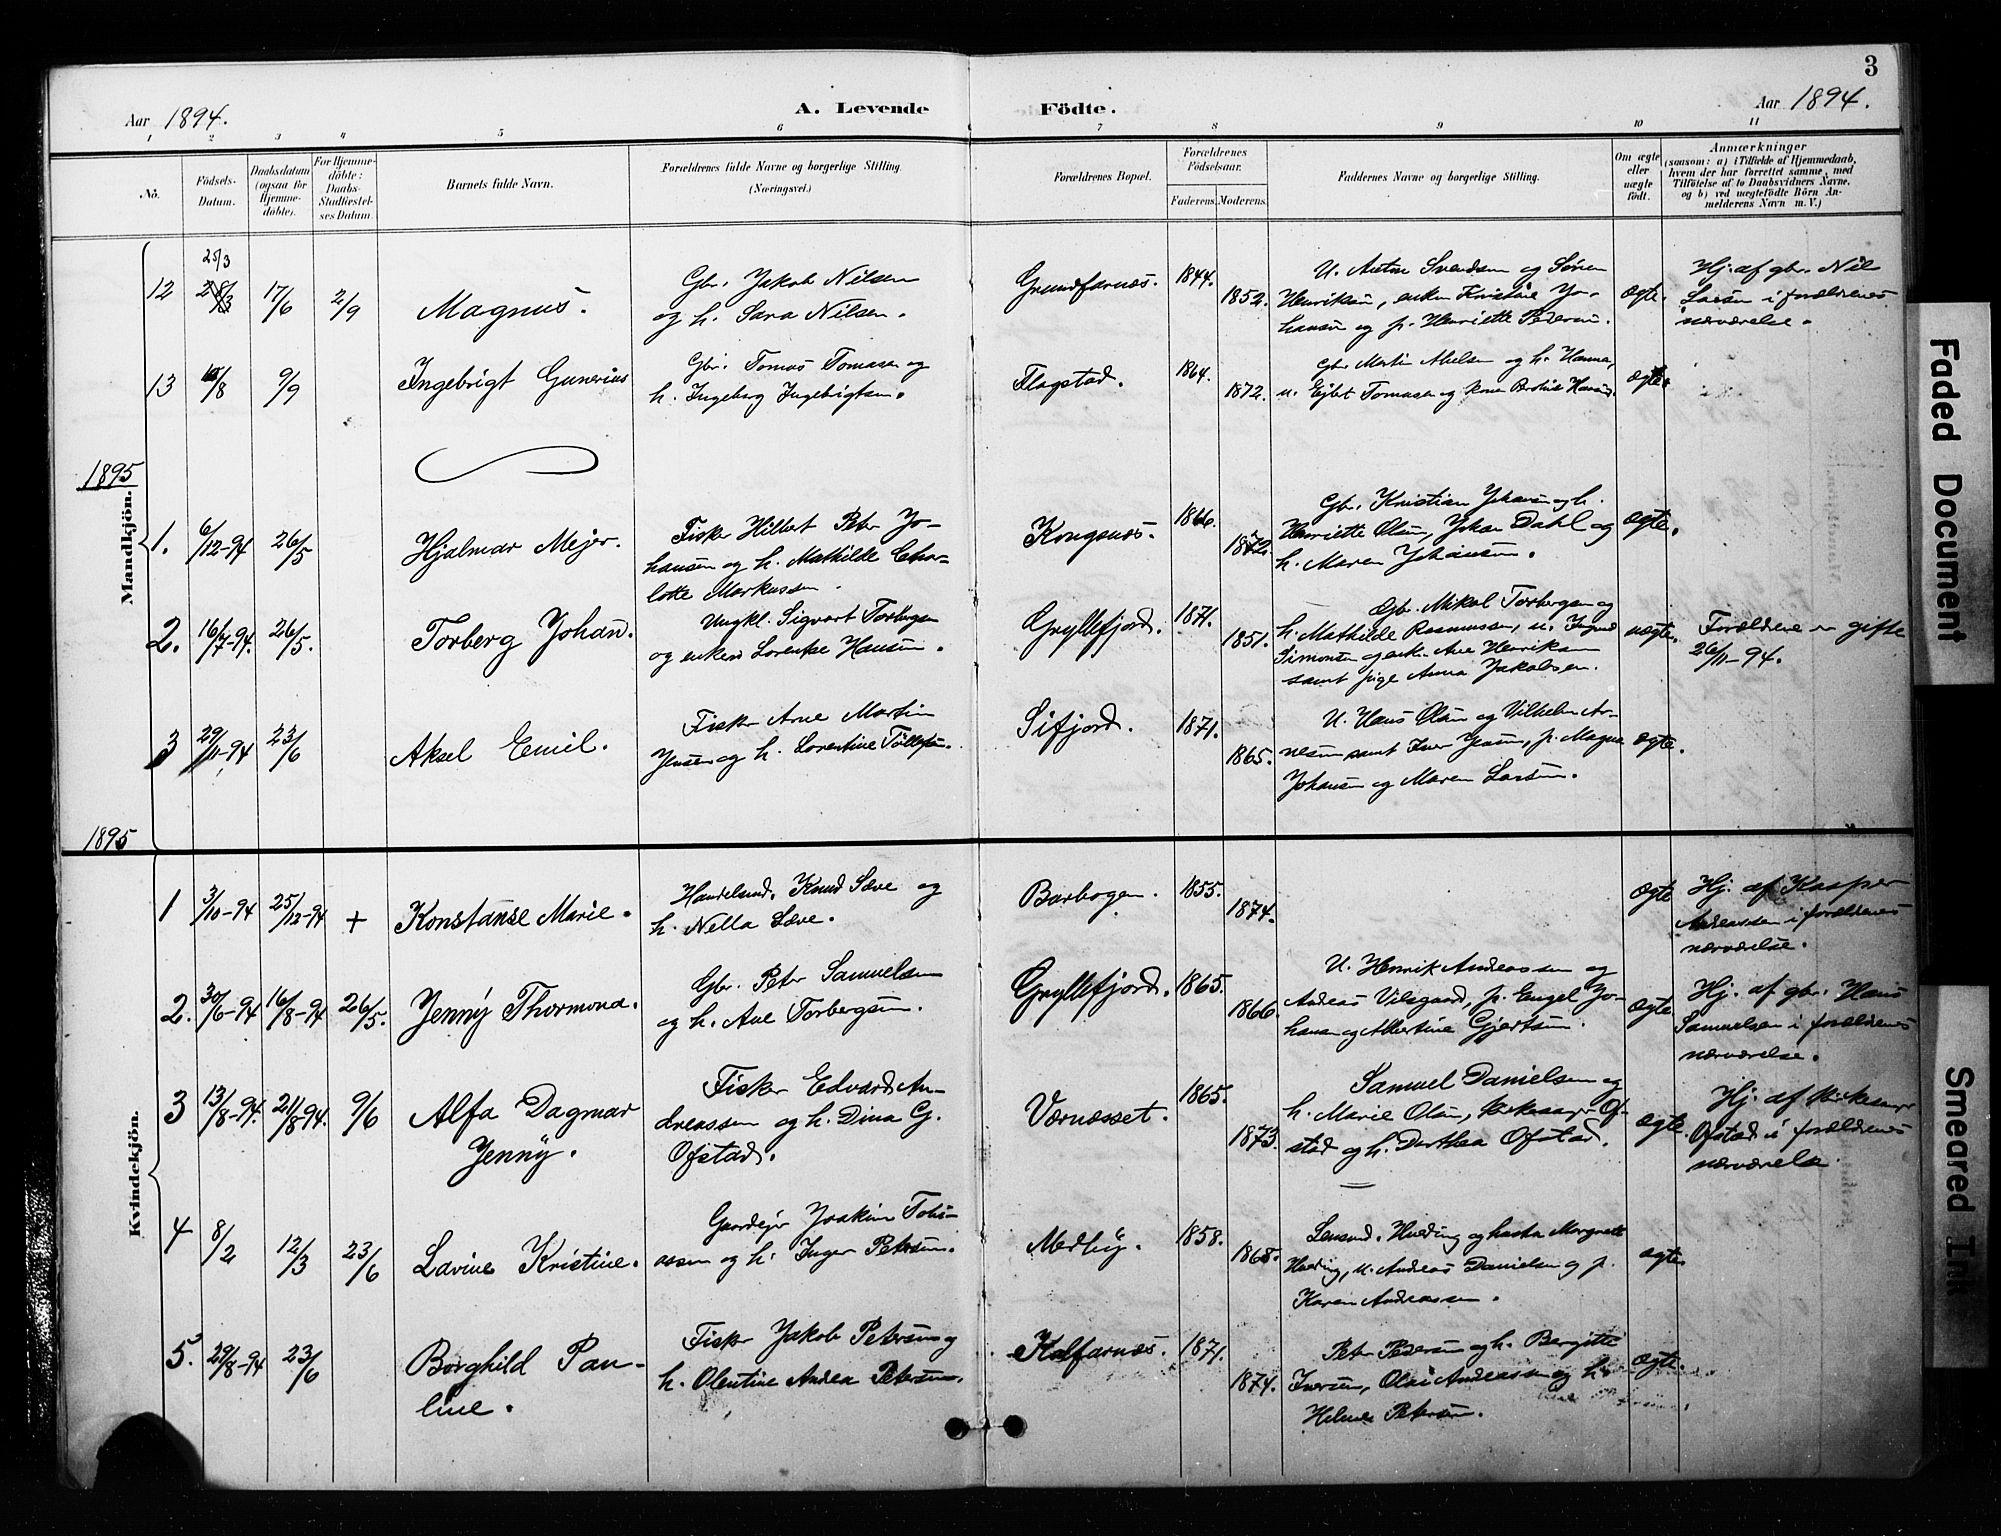 SATØ, Mefjord/Berg sokneprestkontor, G/Ga/Gaa/L0006kirke: Ministerialbok nr. 6, 1894-1904, s. 3